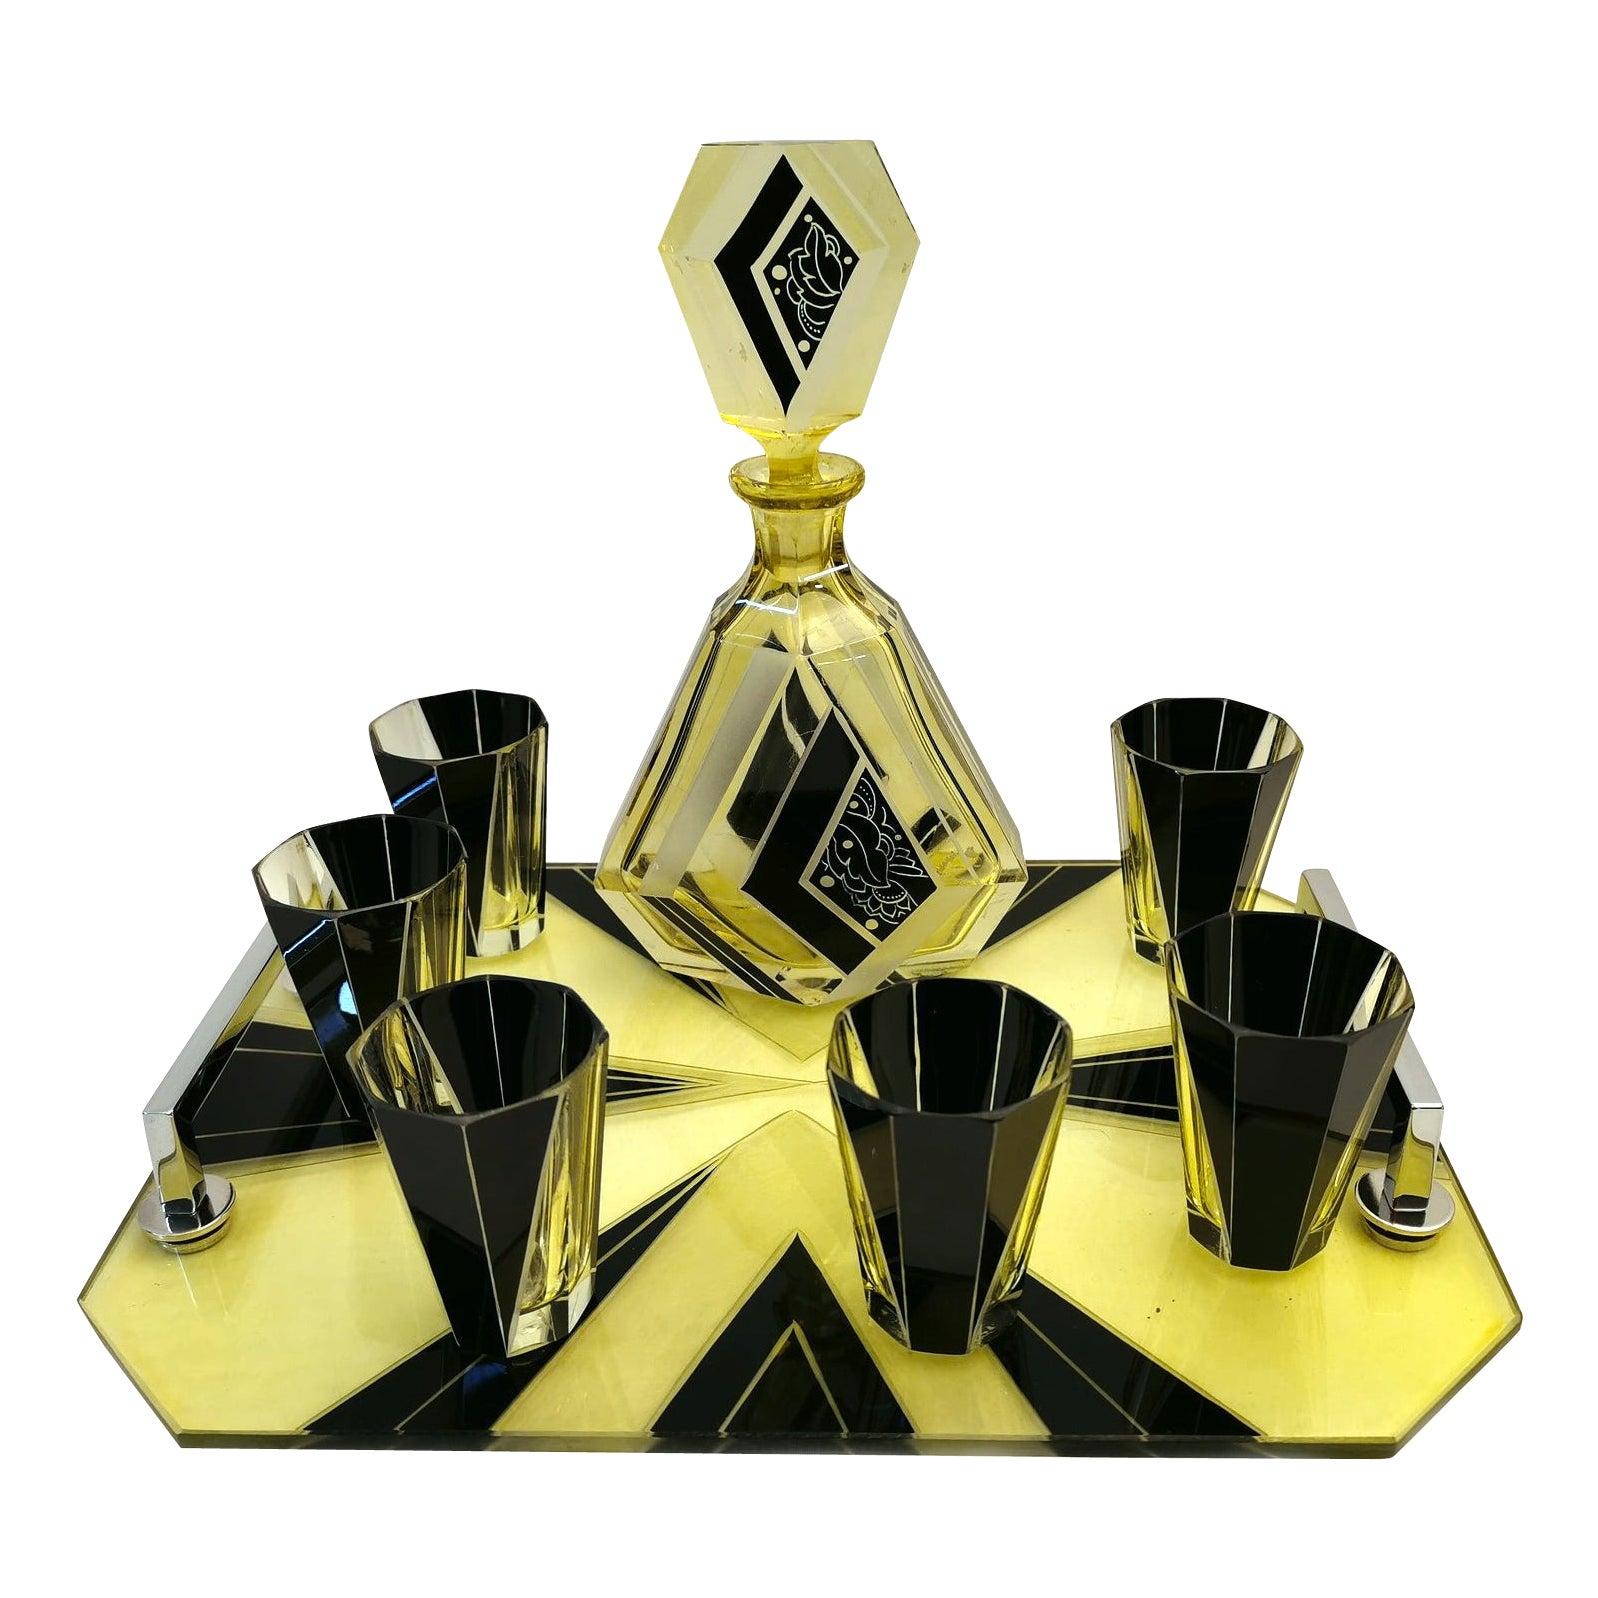 Art Deco Czech Enamel & Glass Decanter Set on Matching Tray